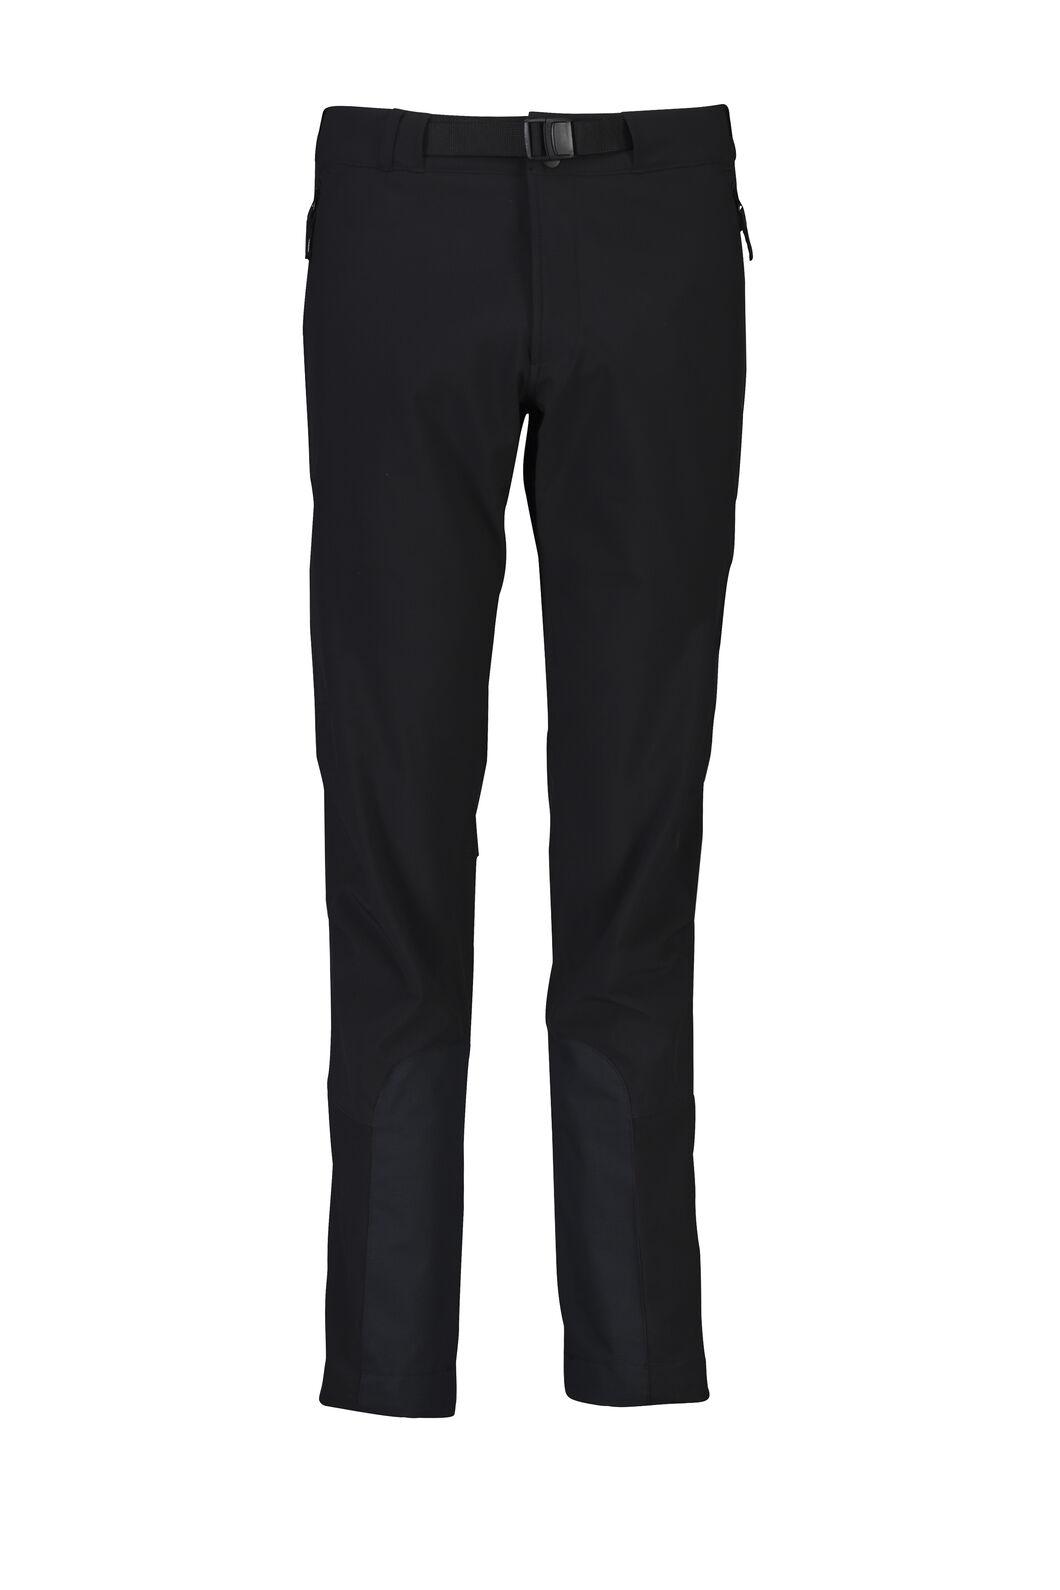 Macpac Fitzroy Alpine Series Softshell Pants - Women's, Black, hi-res